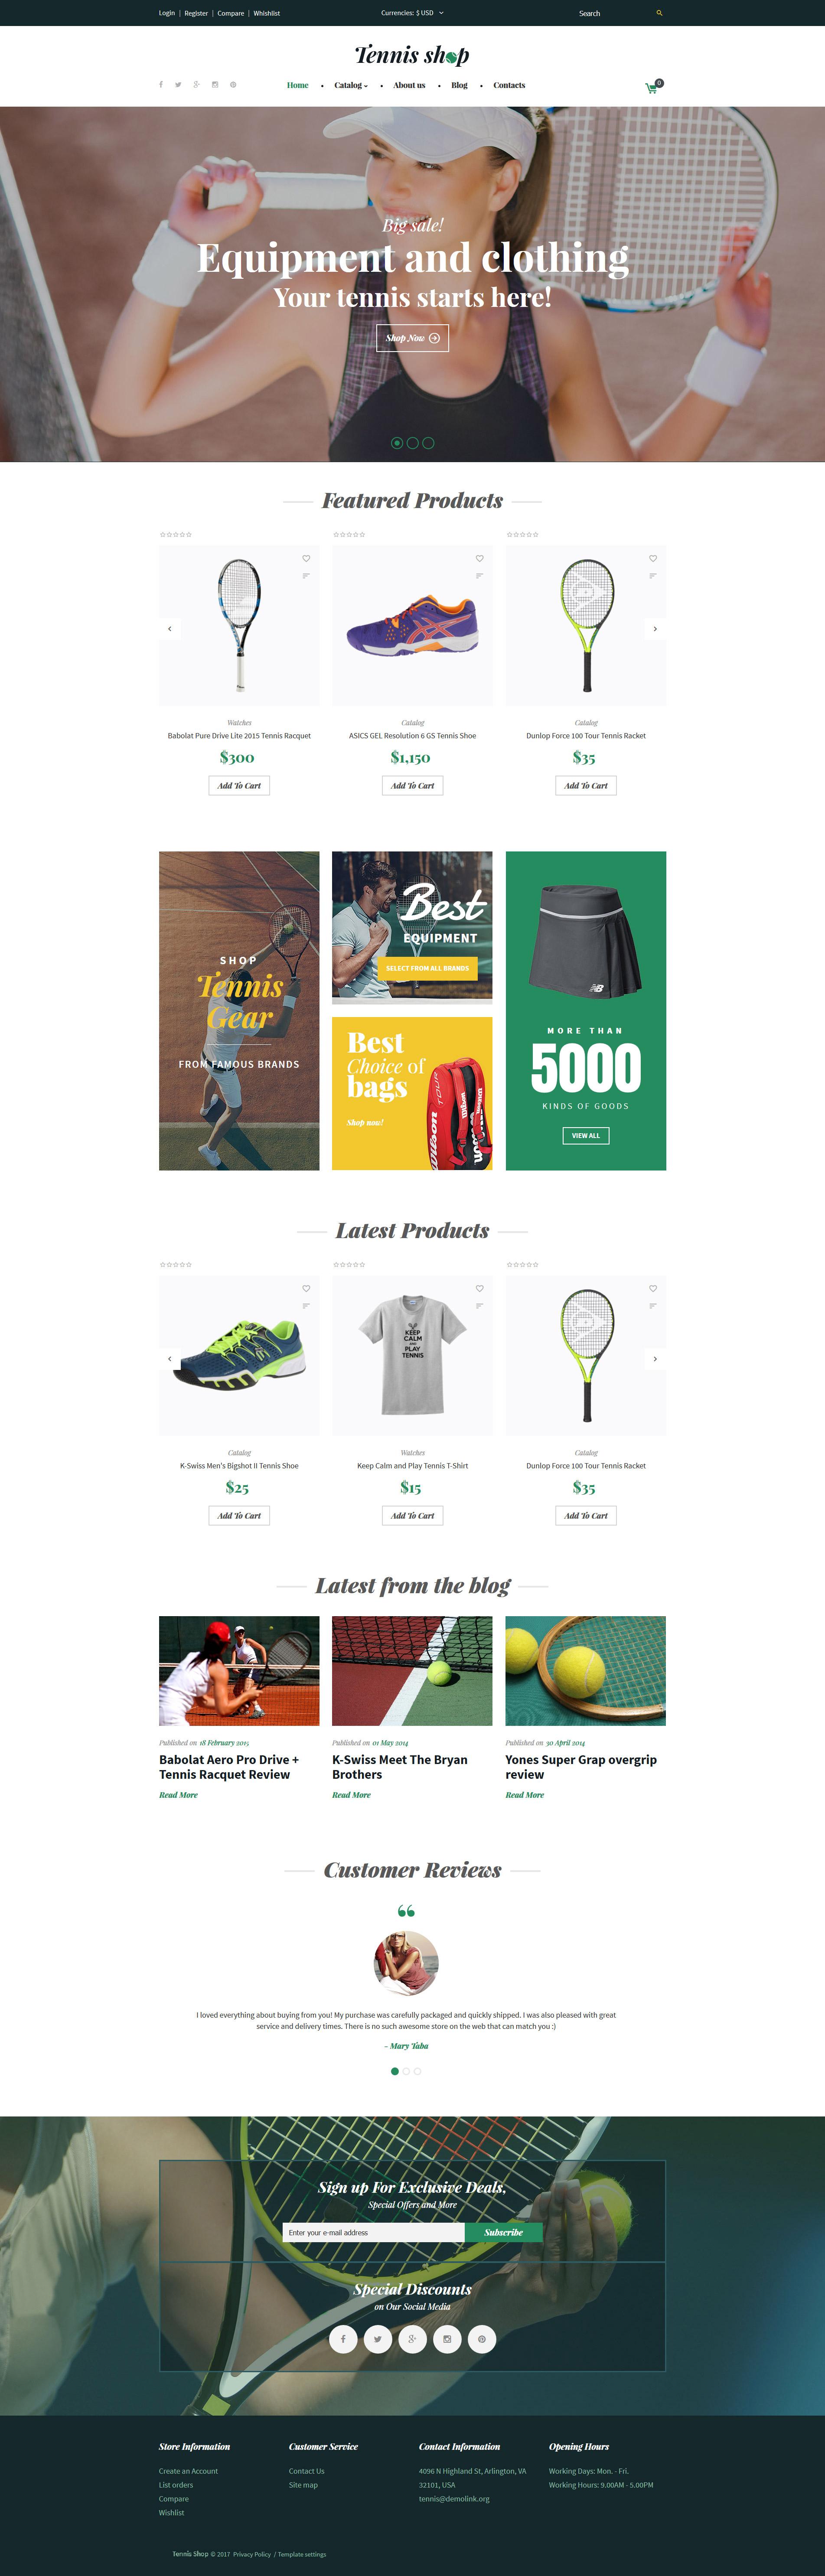 Tennis Shop Virtuemart #62141